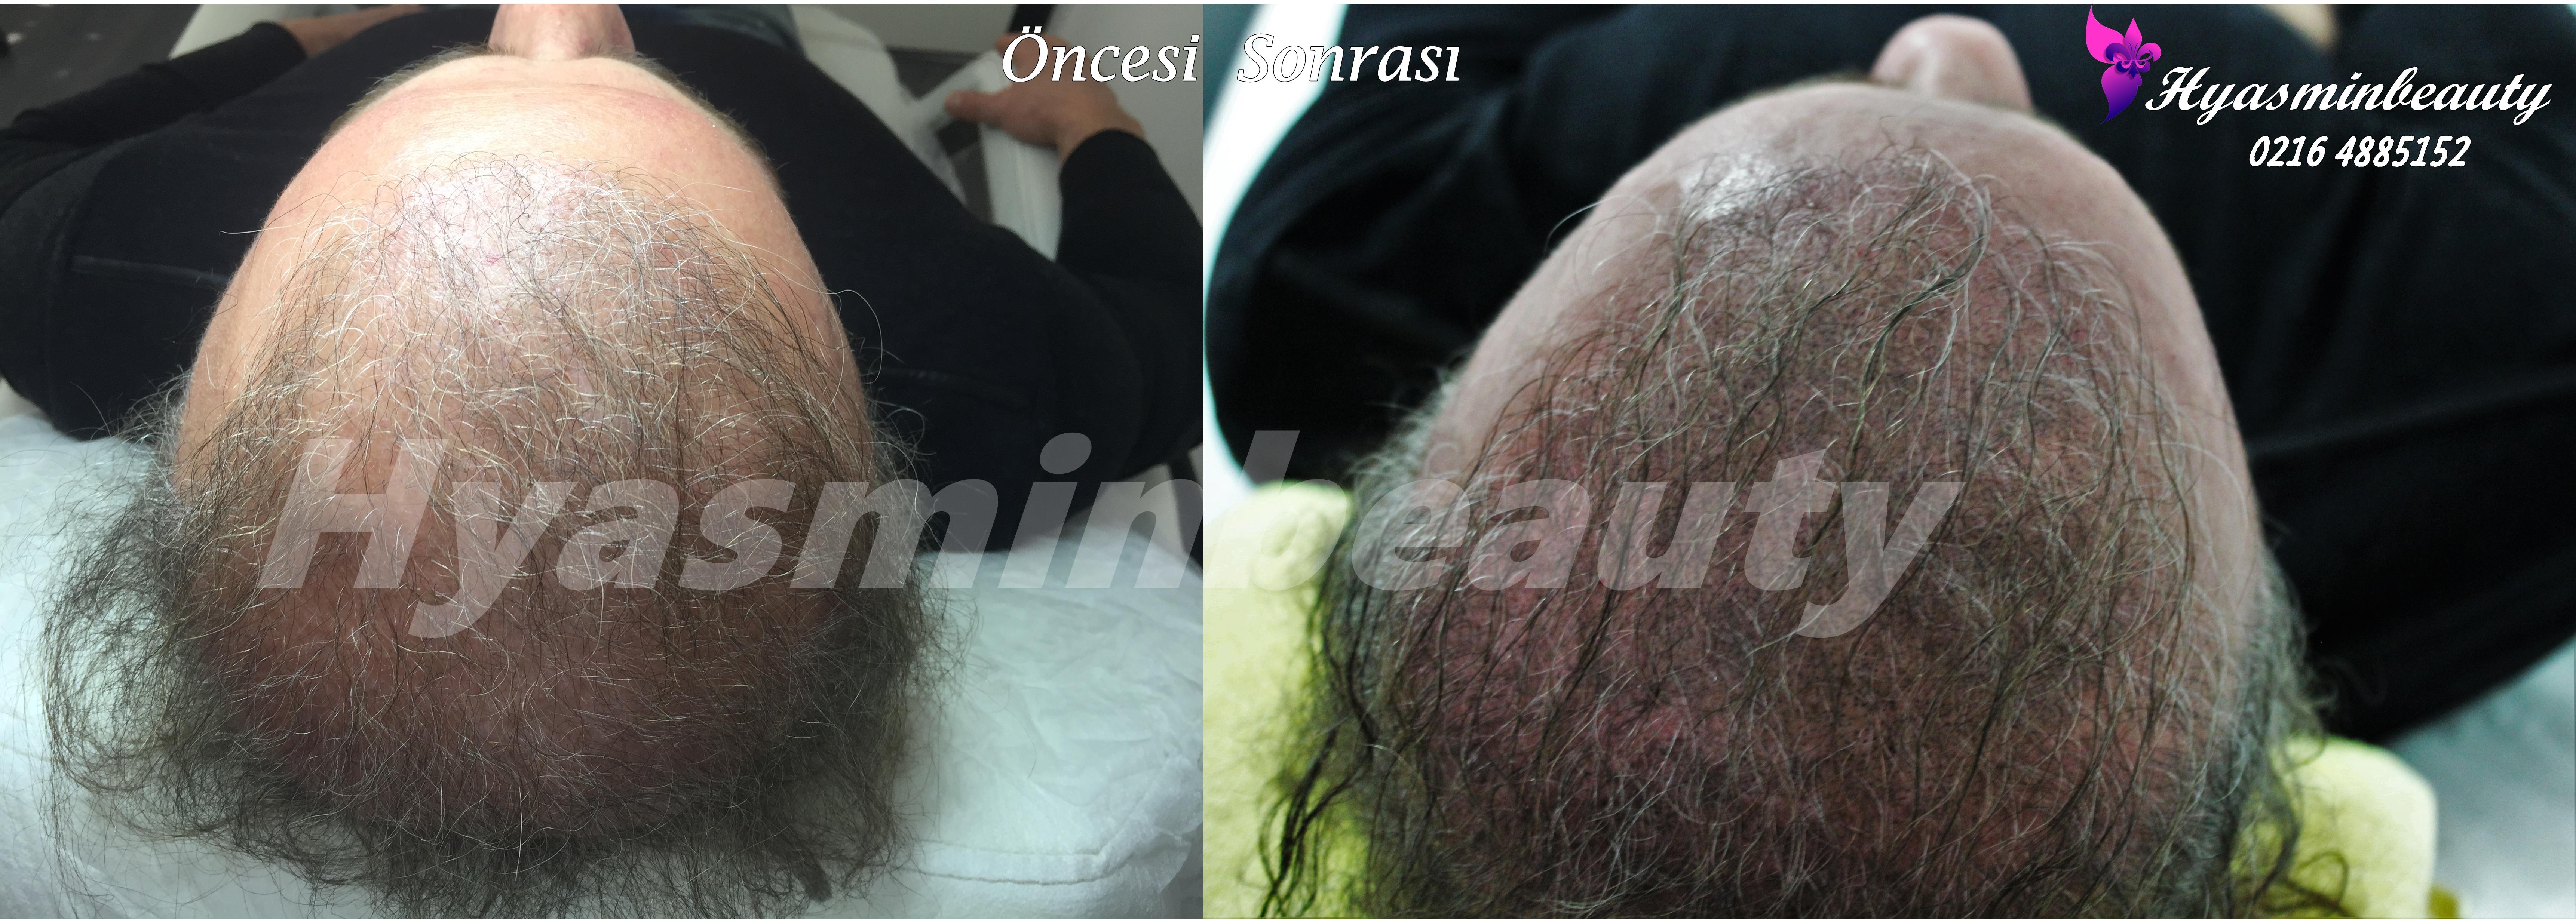 süper saç simülasyonu.JPG